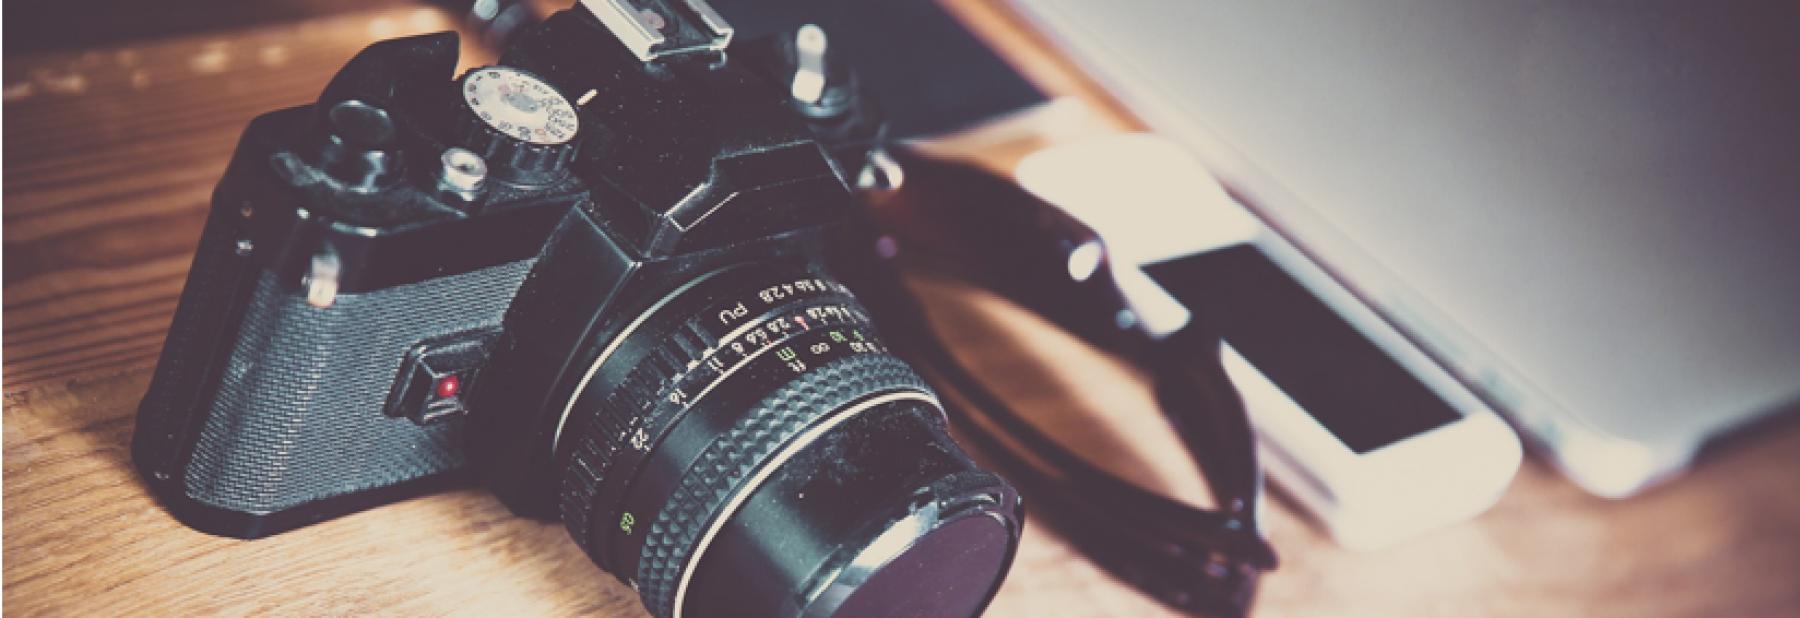 fotocamera_analogica